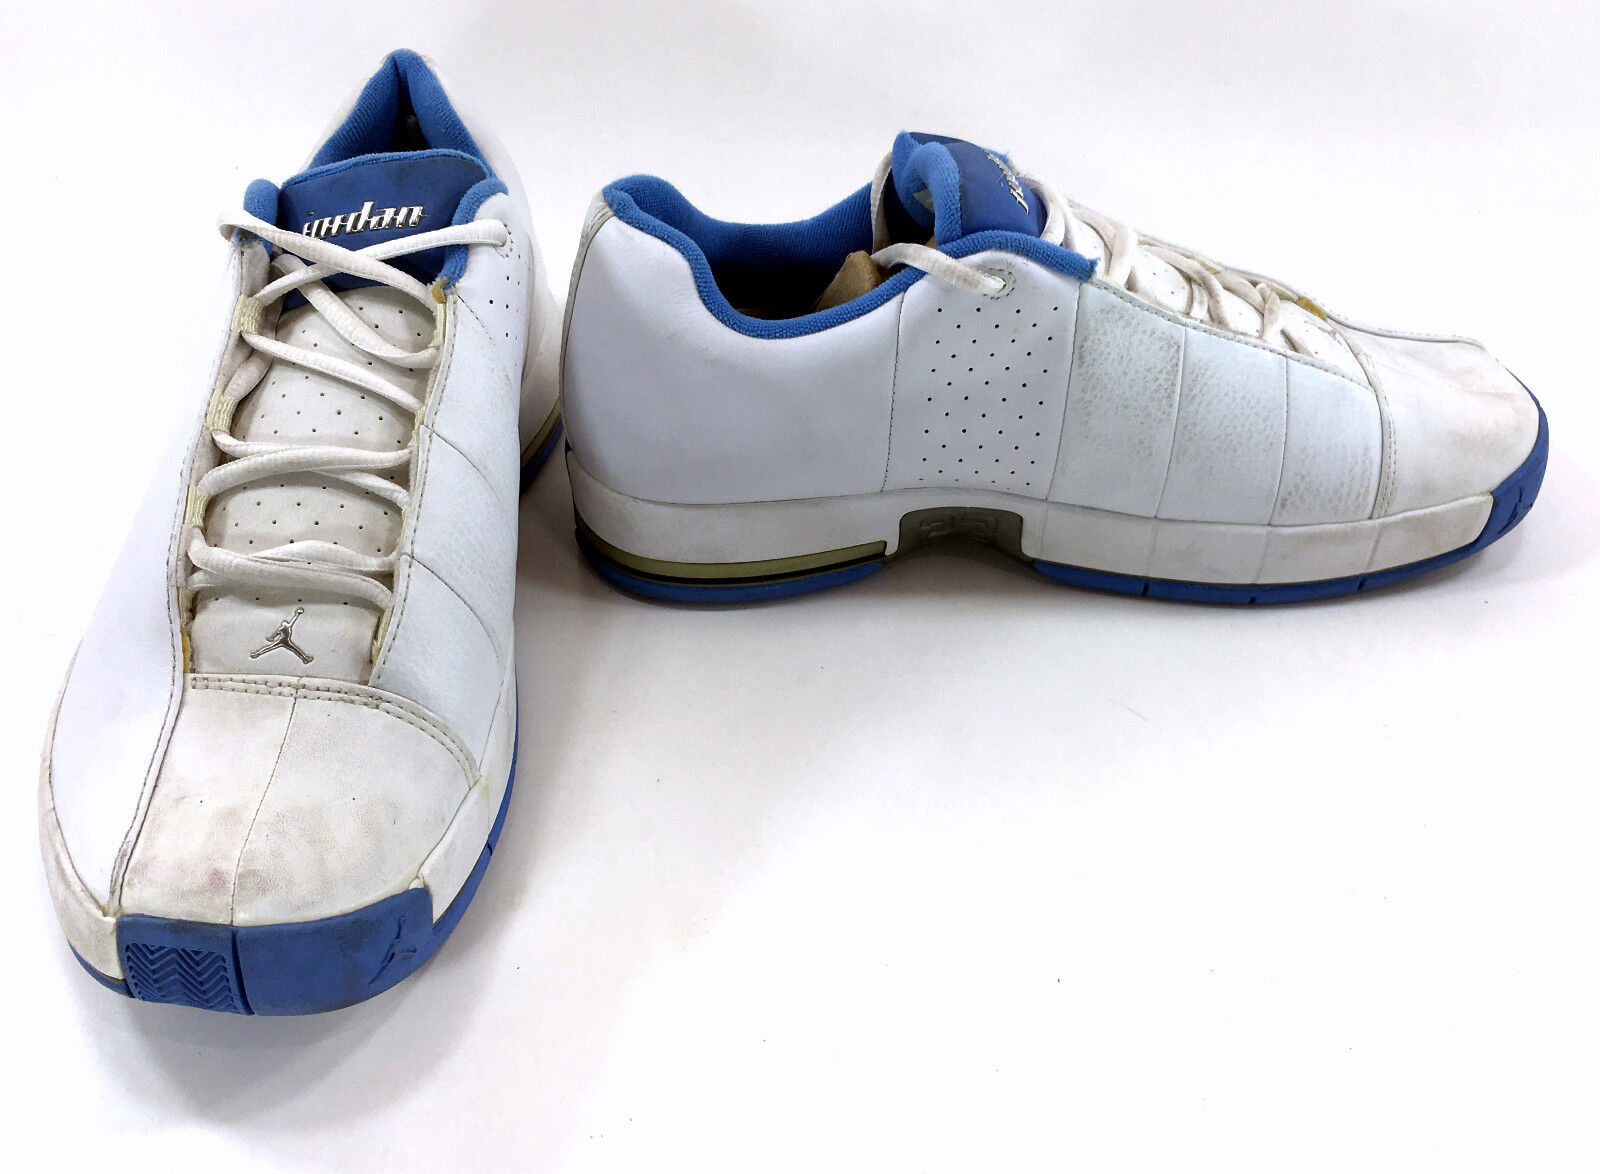 nike schuhe air jordan ii - team elite - ii jordan - 2 niedrigen weißen / blaue turnschuhe missverhältnis 9.5/9 e1258a